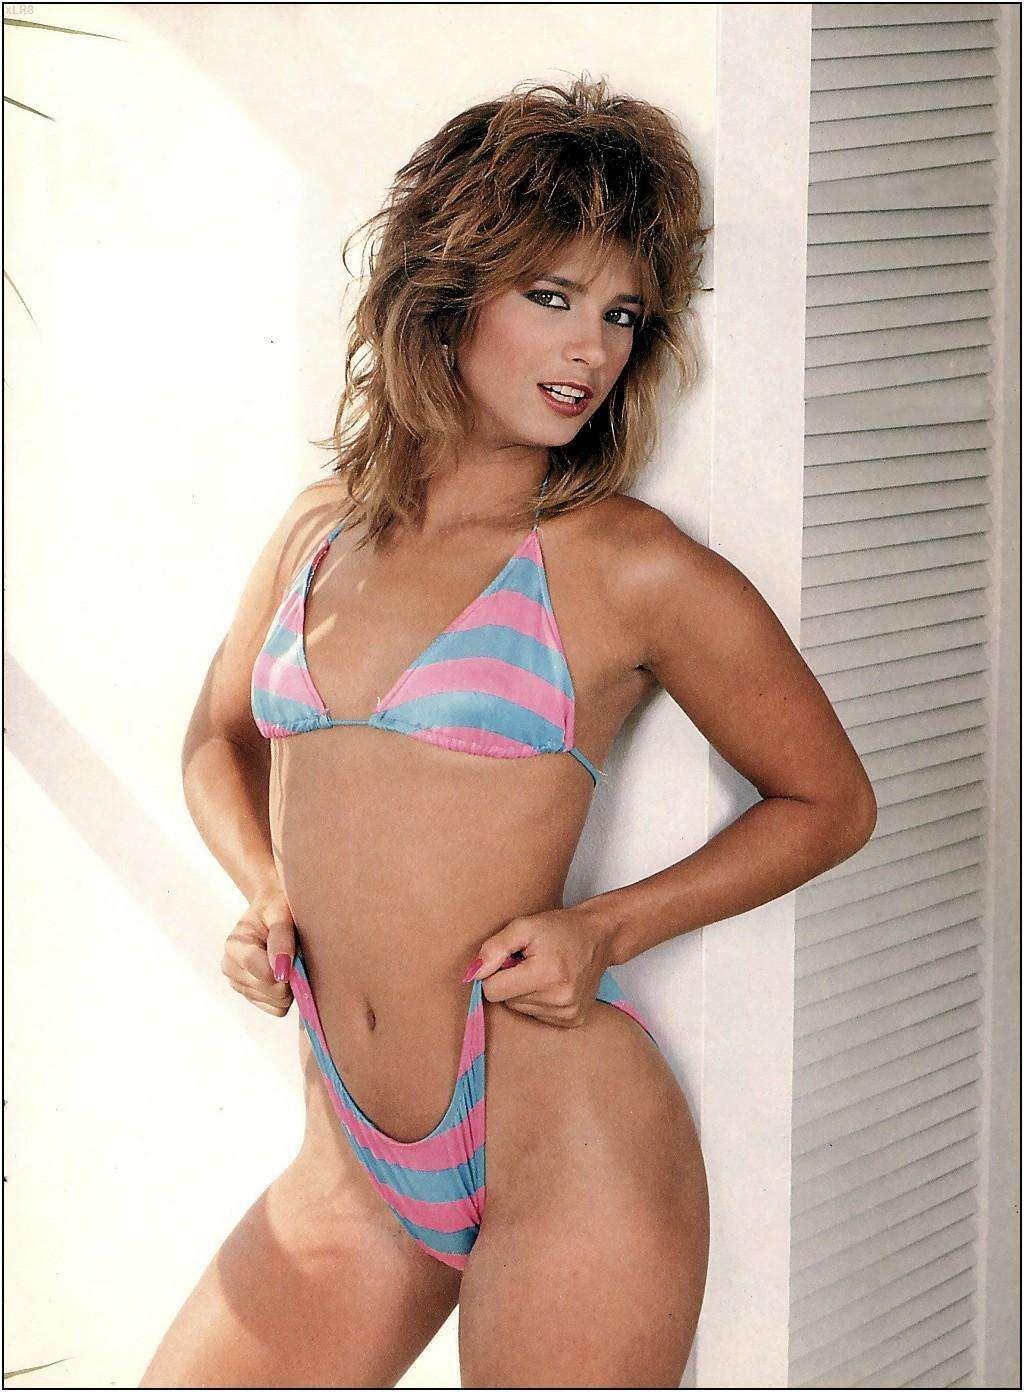 80S Ebony Porn black female porn star photos 80s - pornstar - hot pics